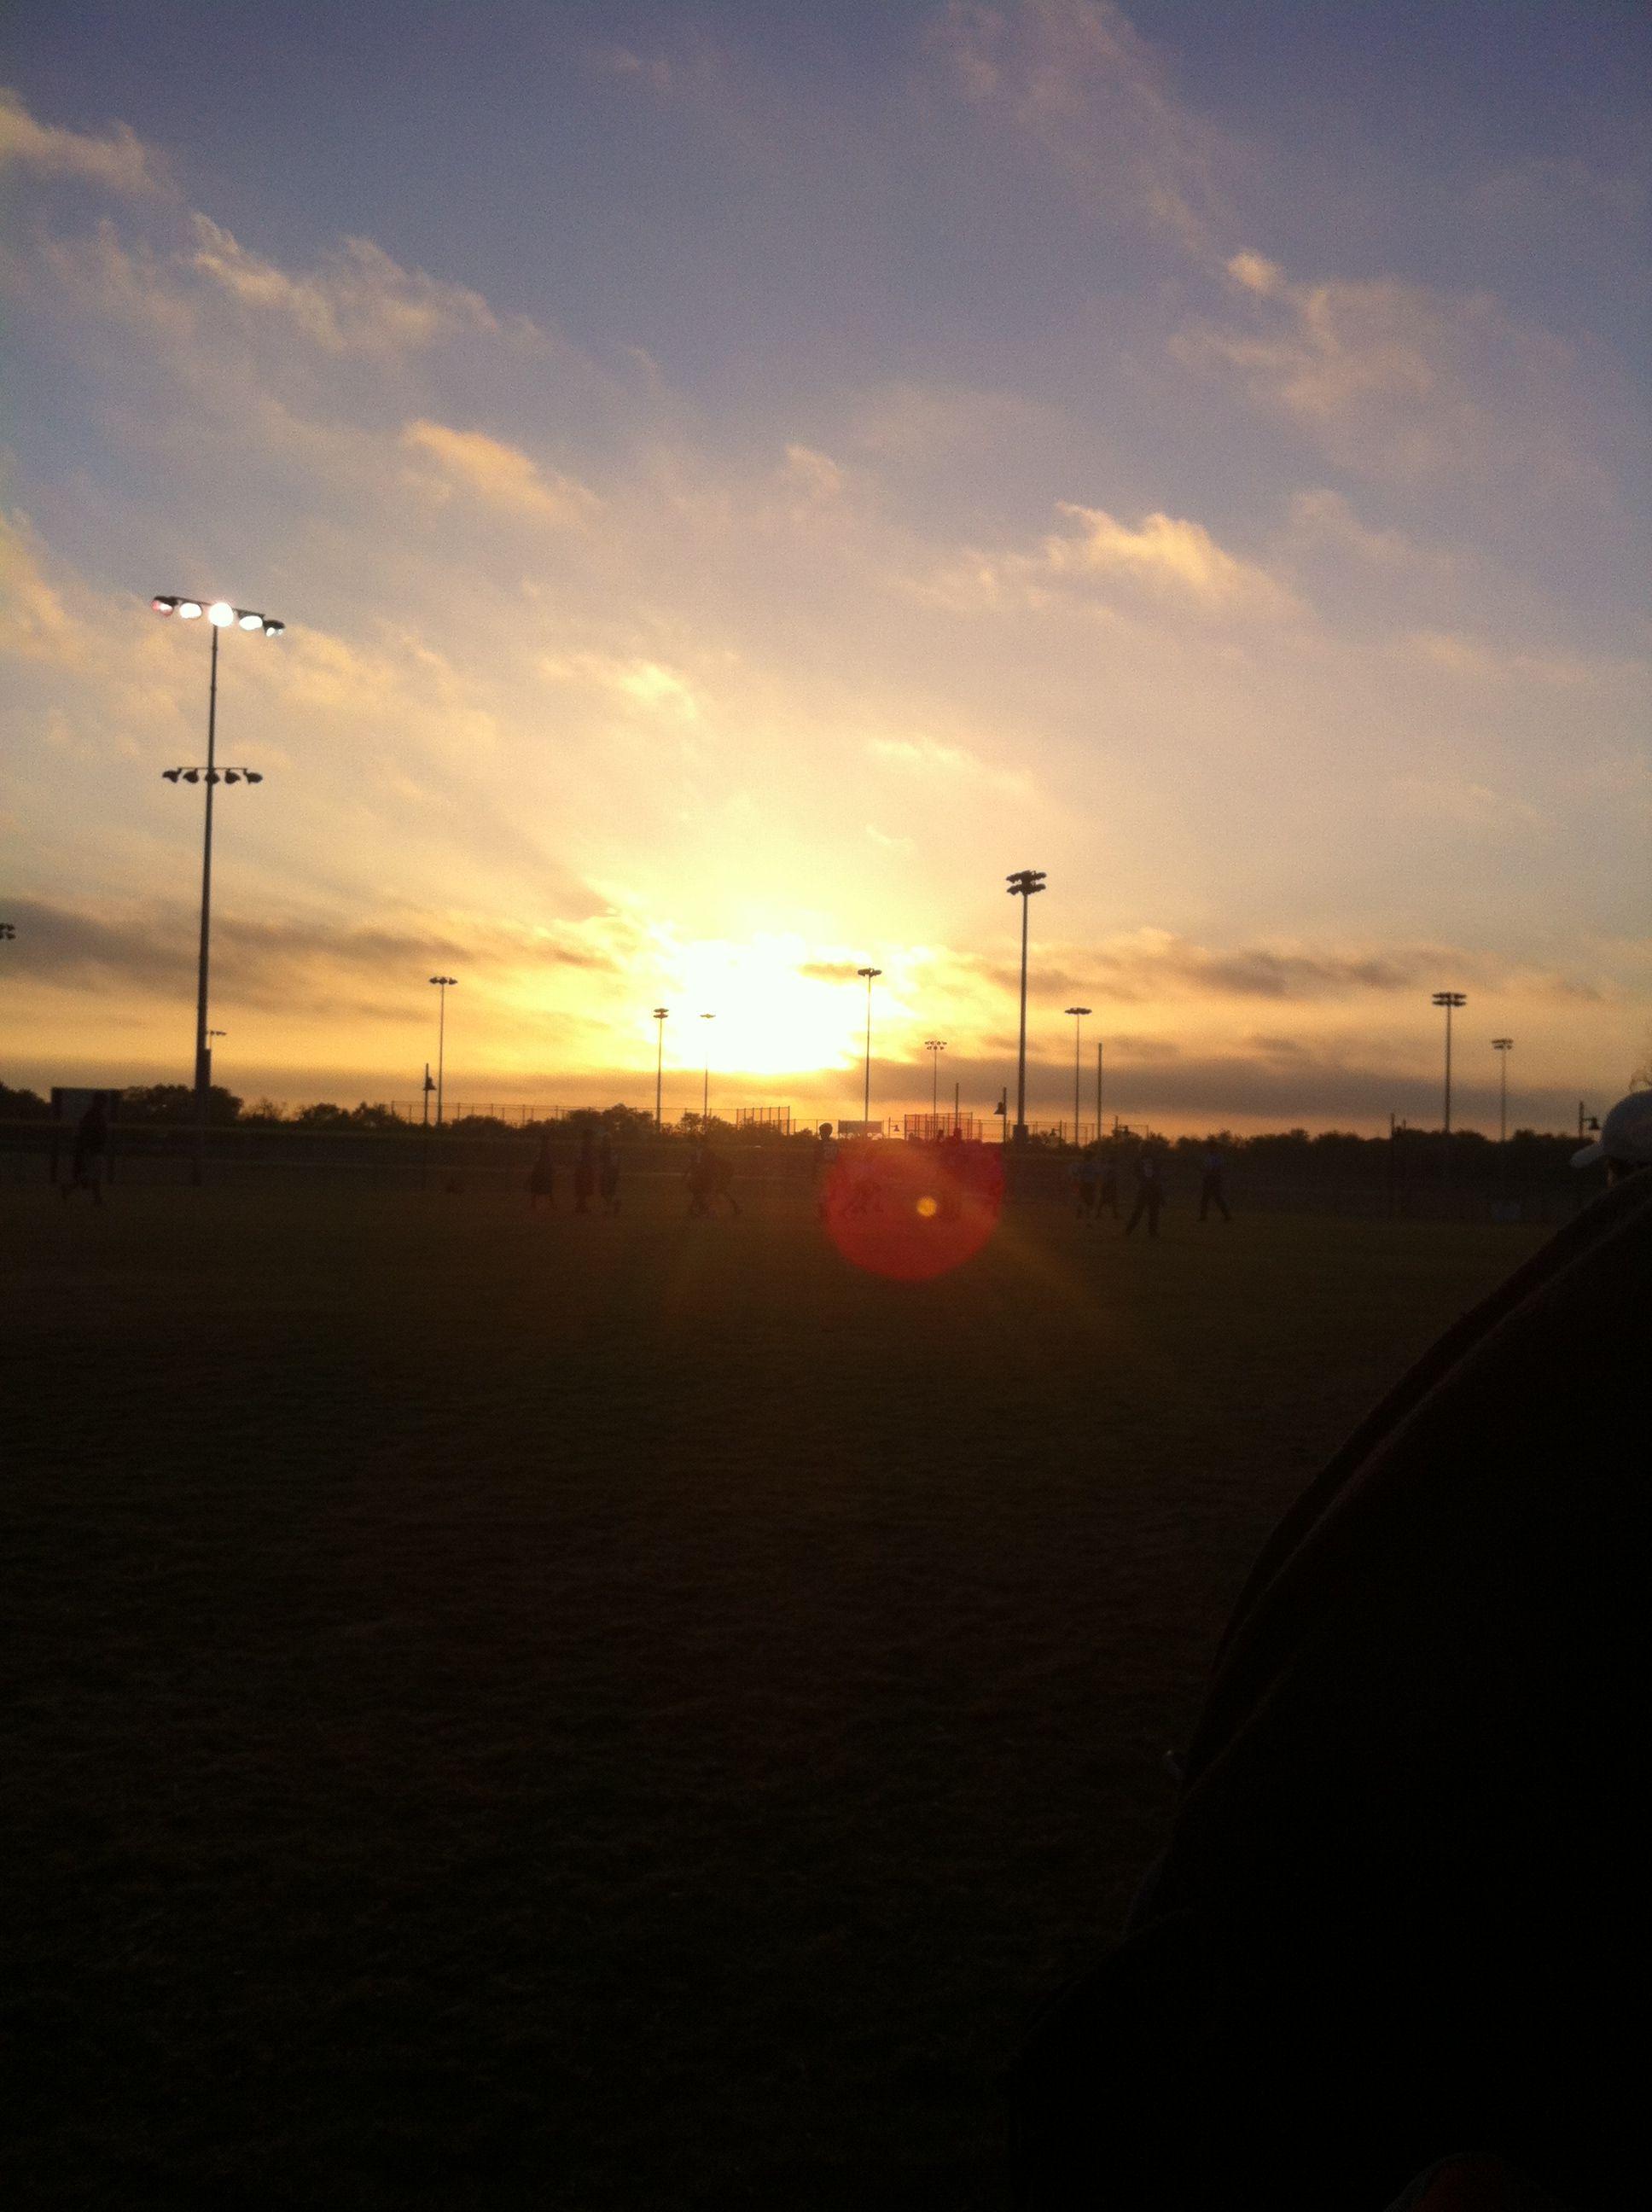 Football in the sunrise!